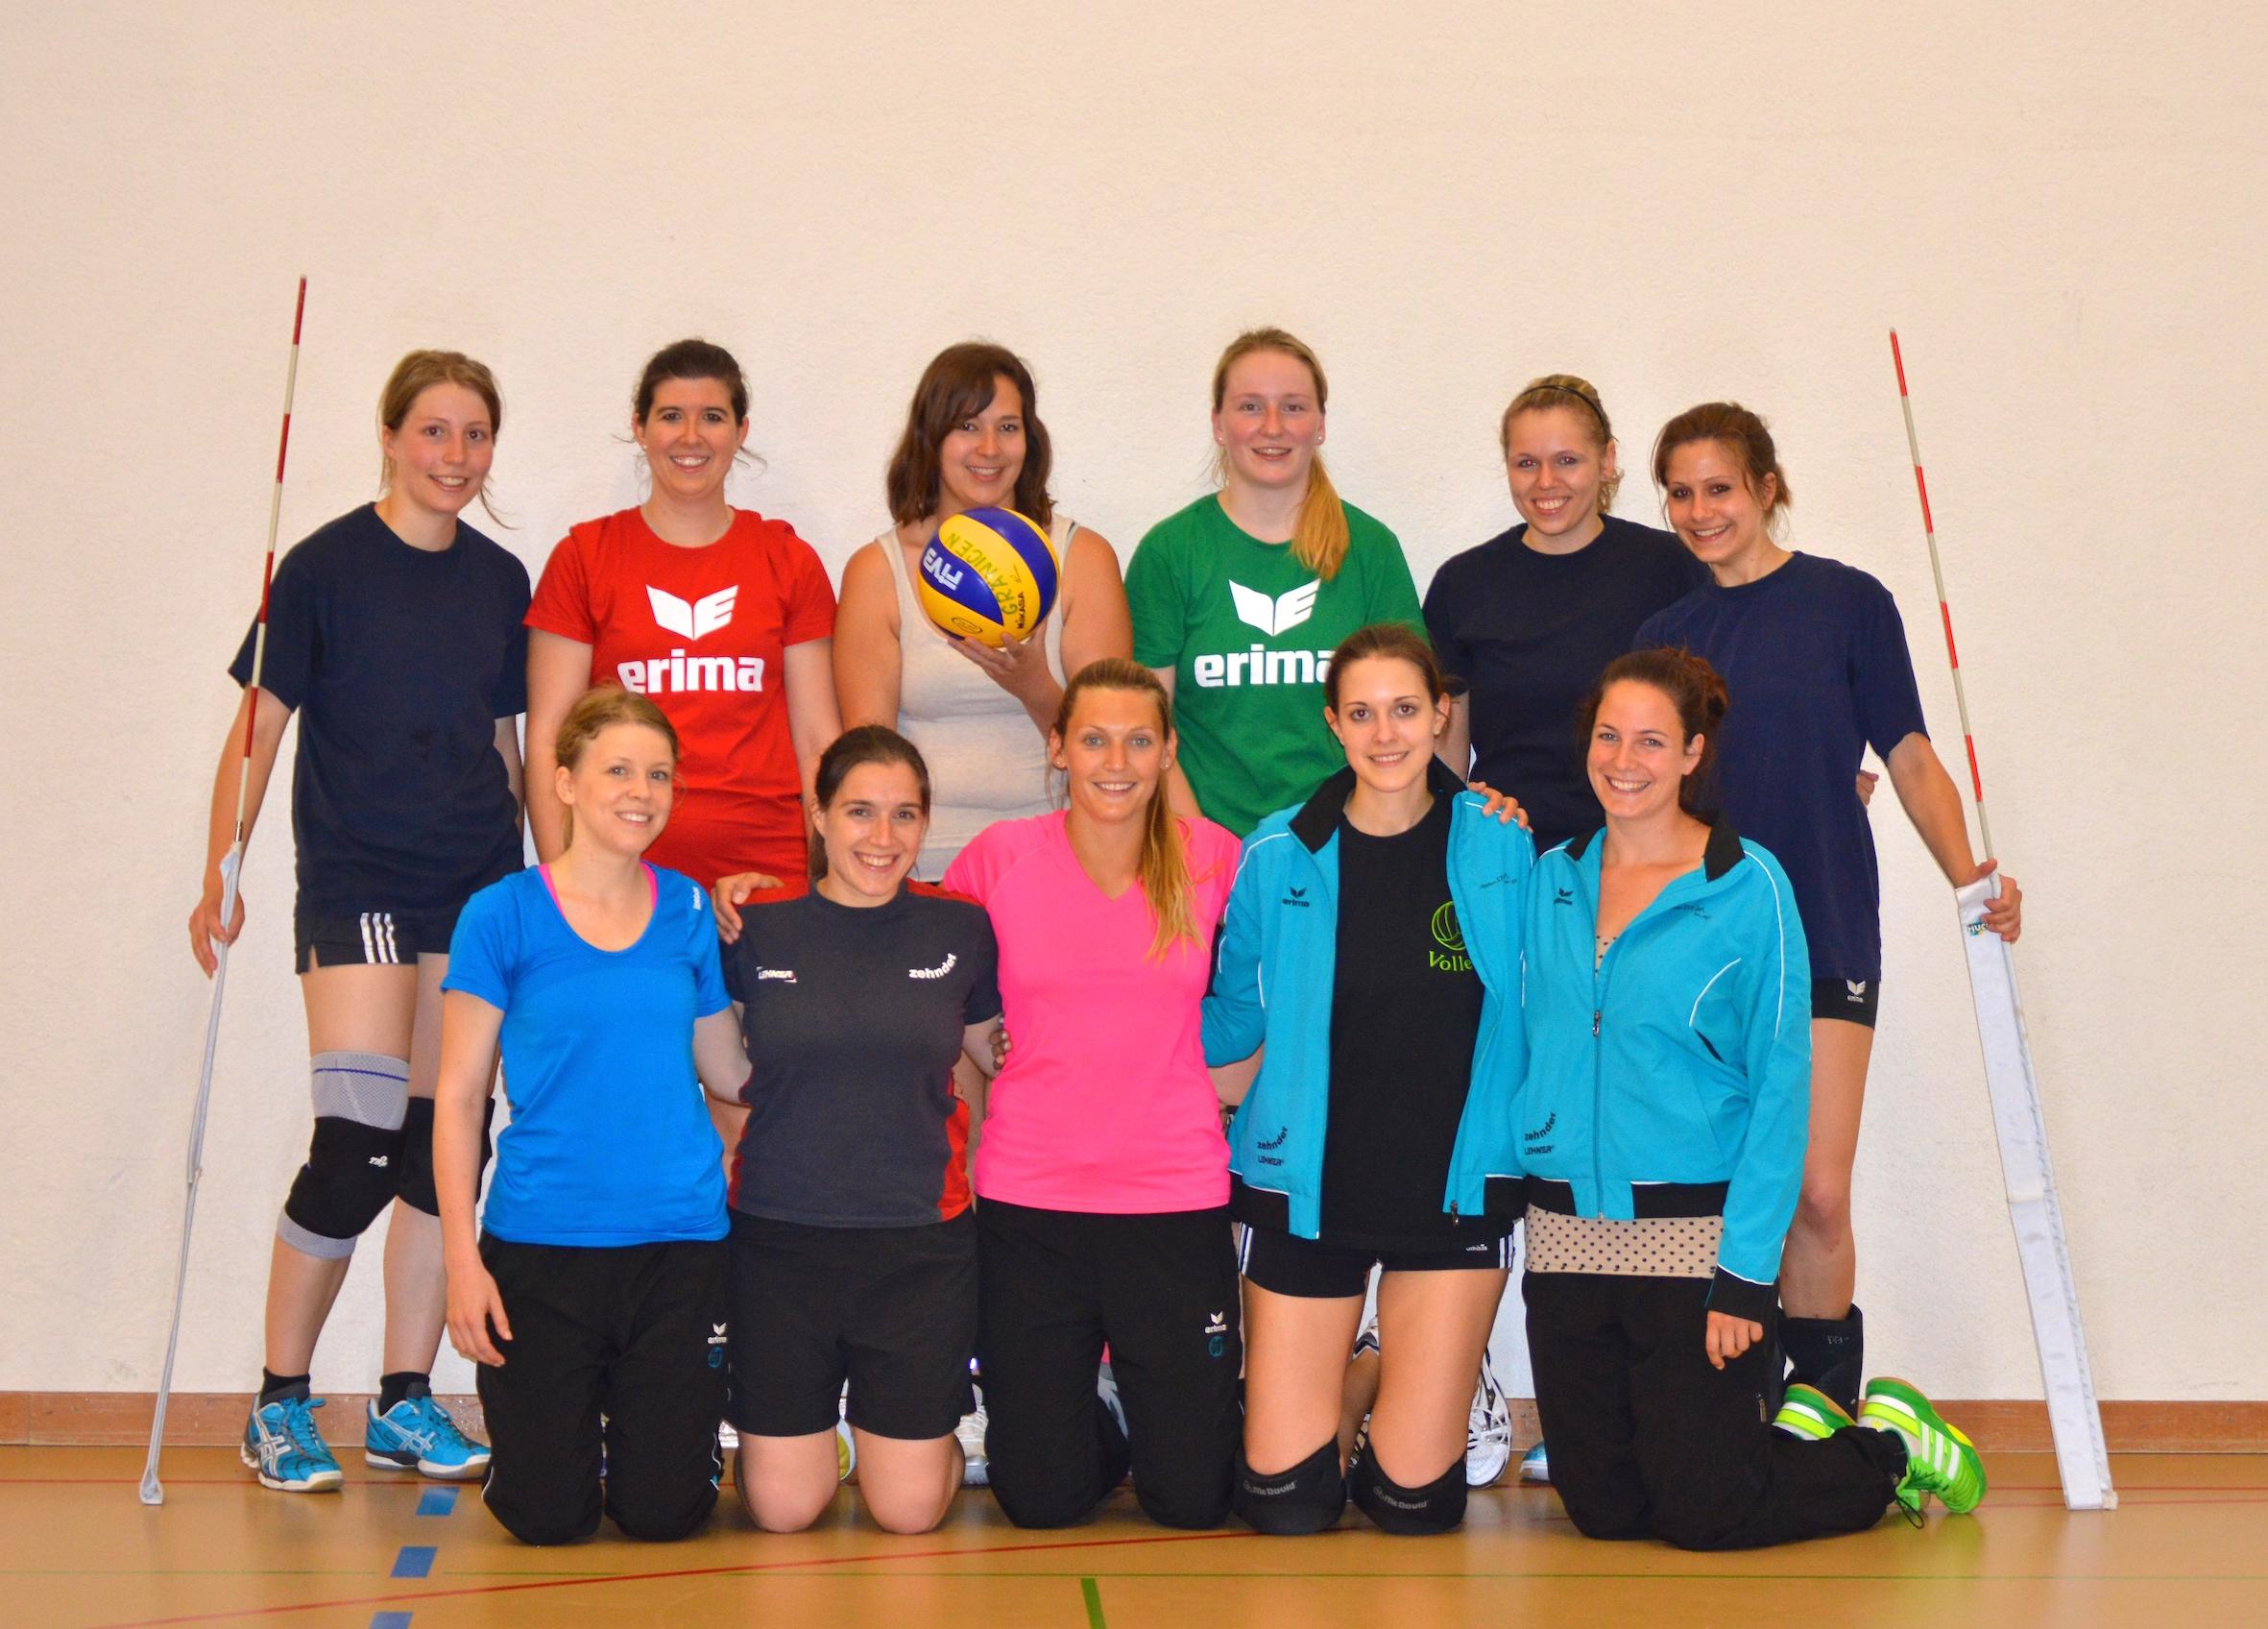 volleyball 3 liga damen